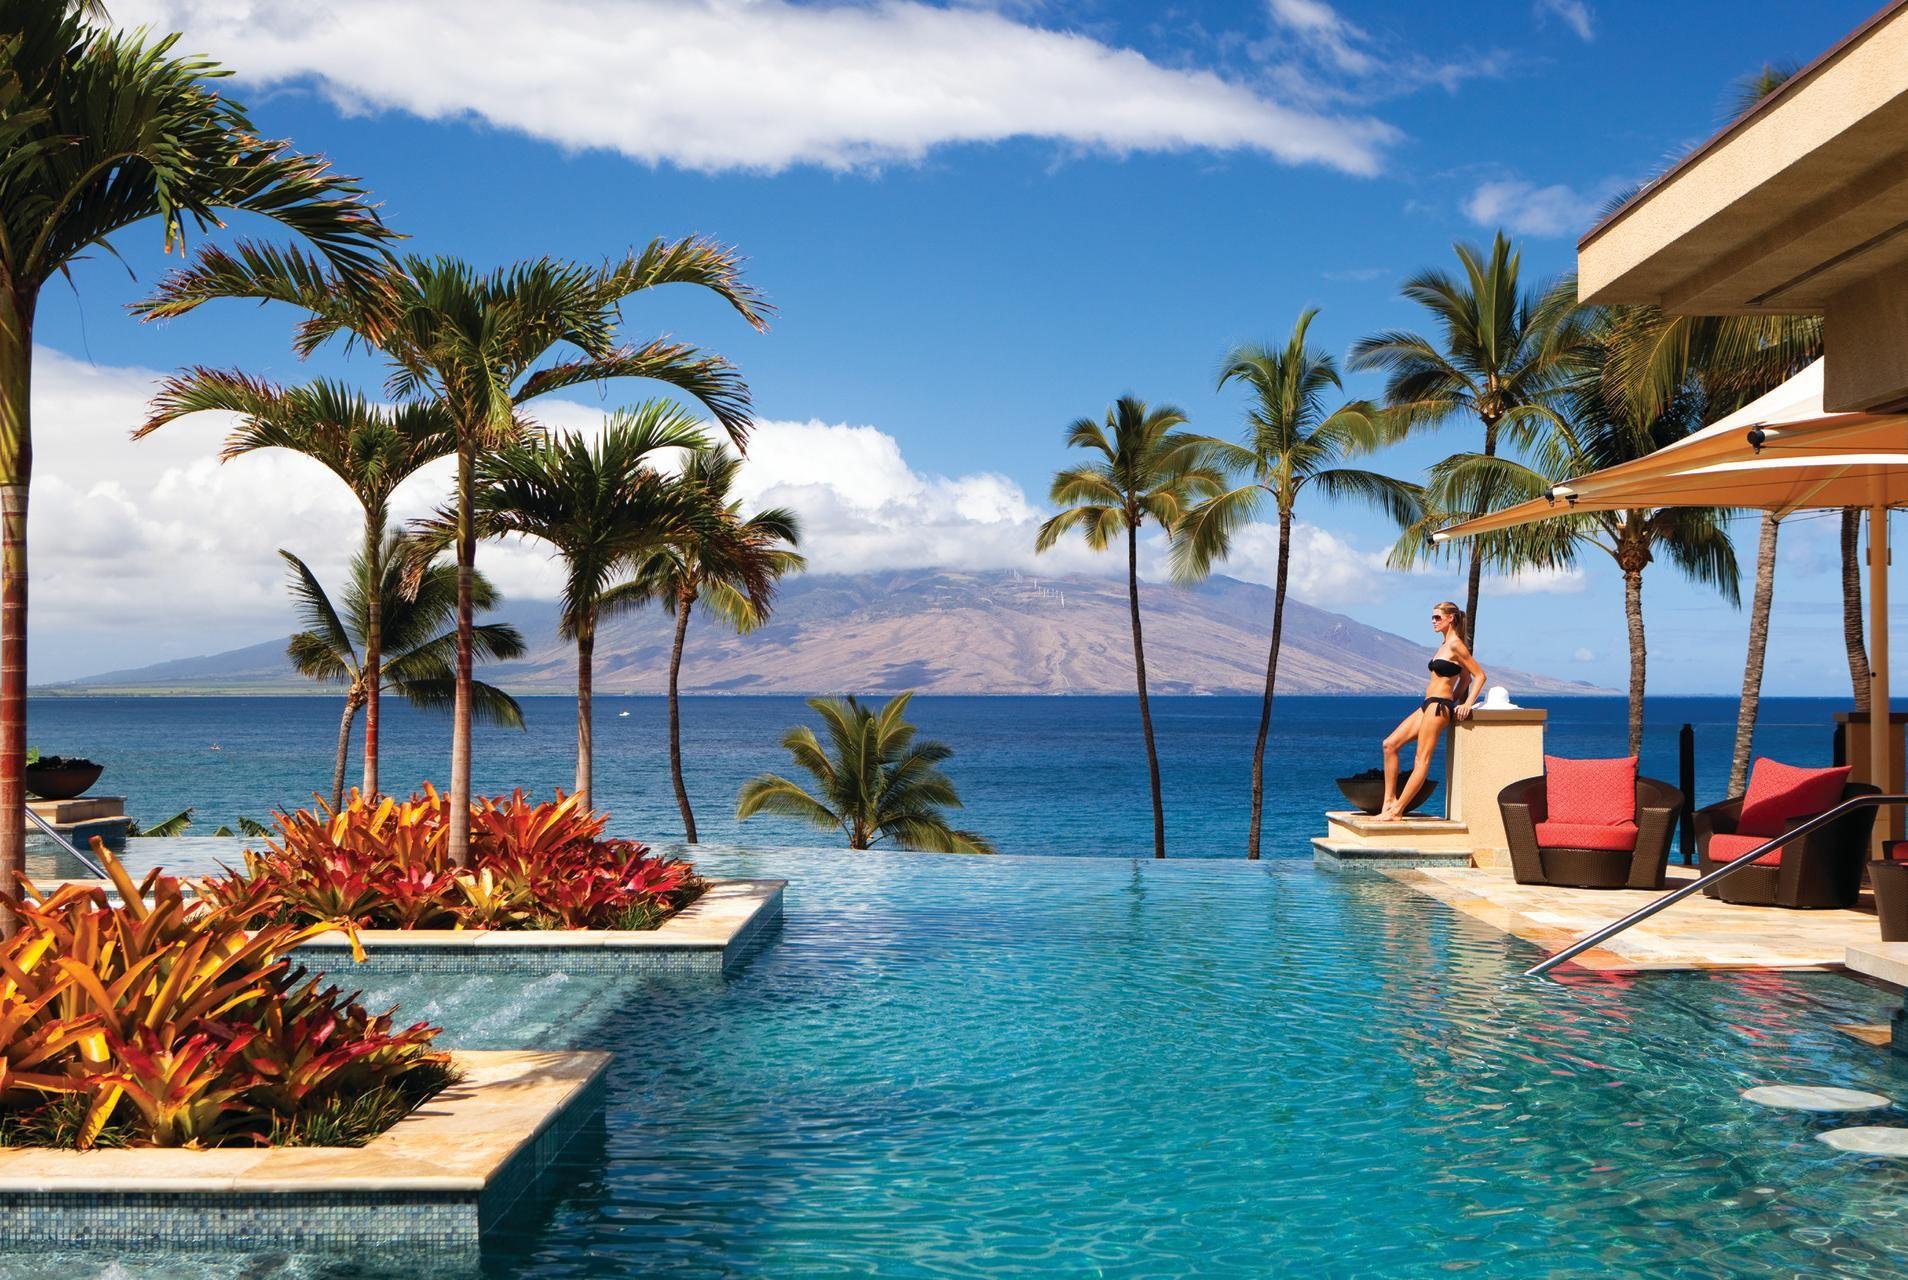 fancy-tropical-swimming-pool-widescreen-hd-wallpaper-for-desktop ...